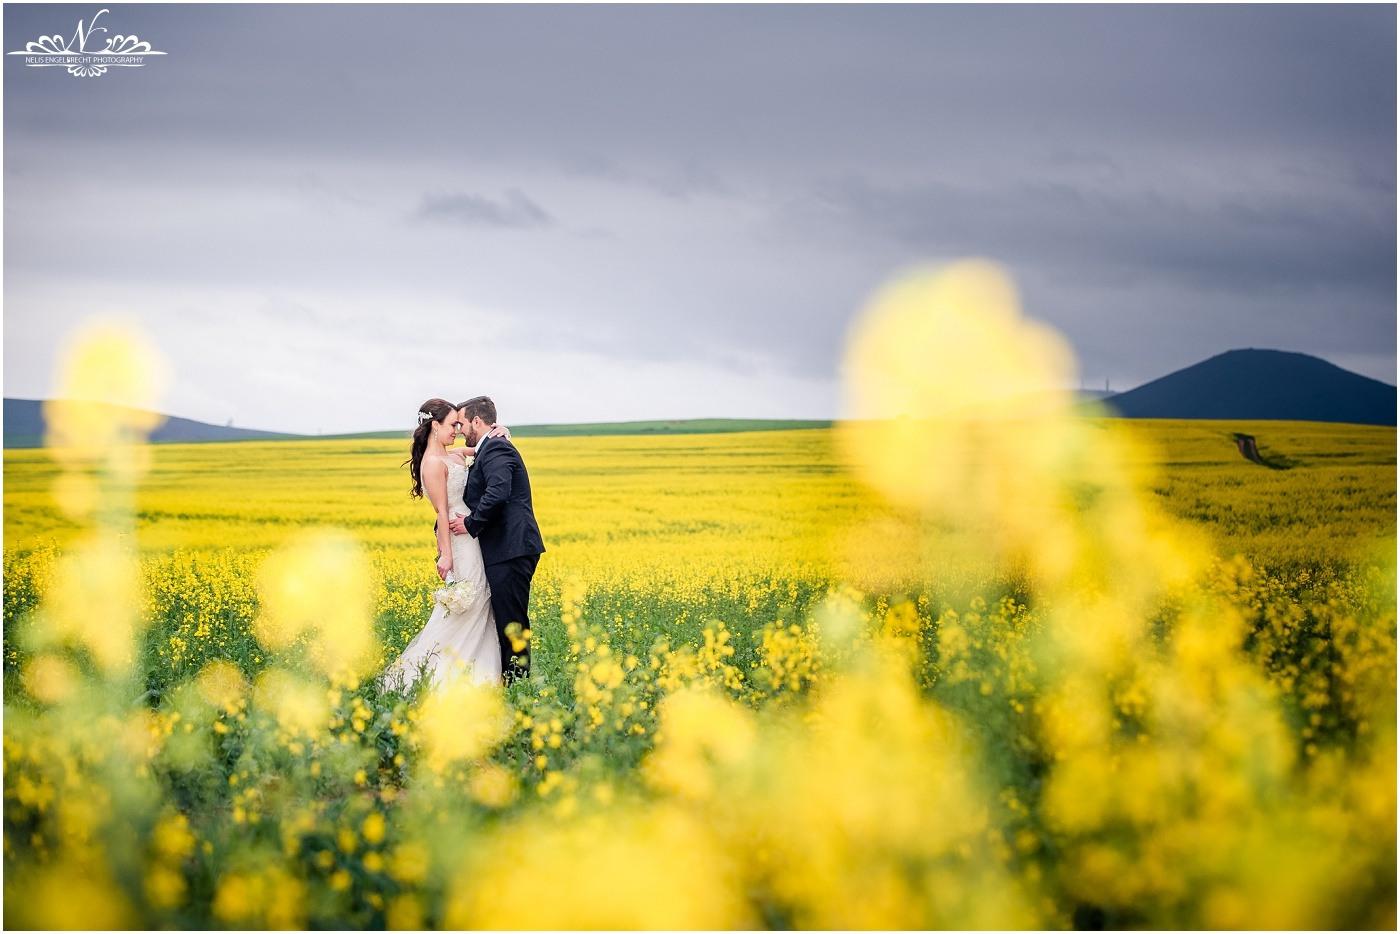 Eensgezind-Wedding-Photos-Nelis-Engelbrecht-Photography-133